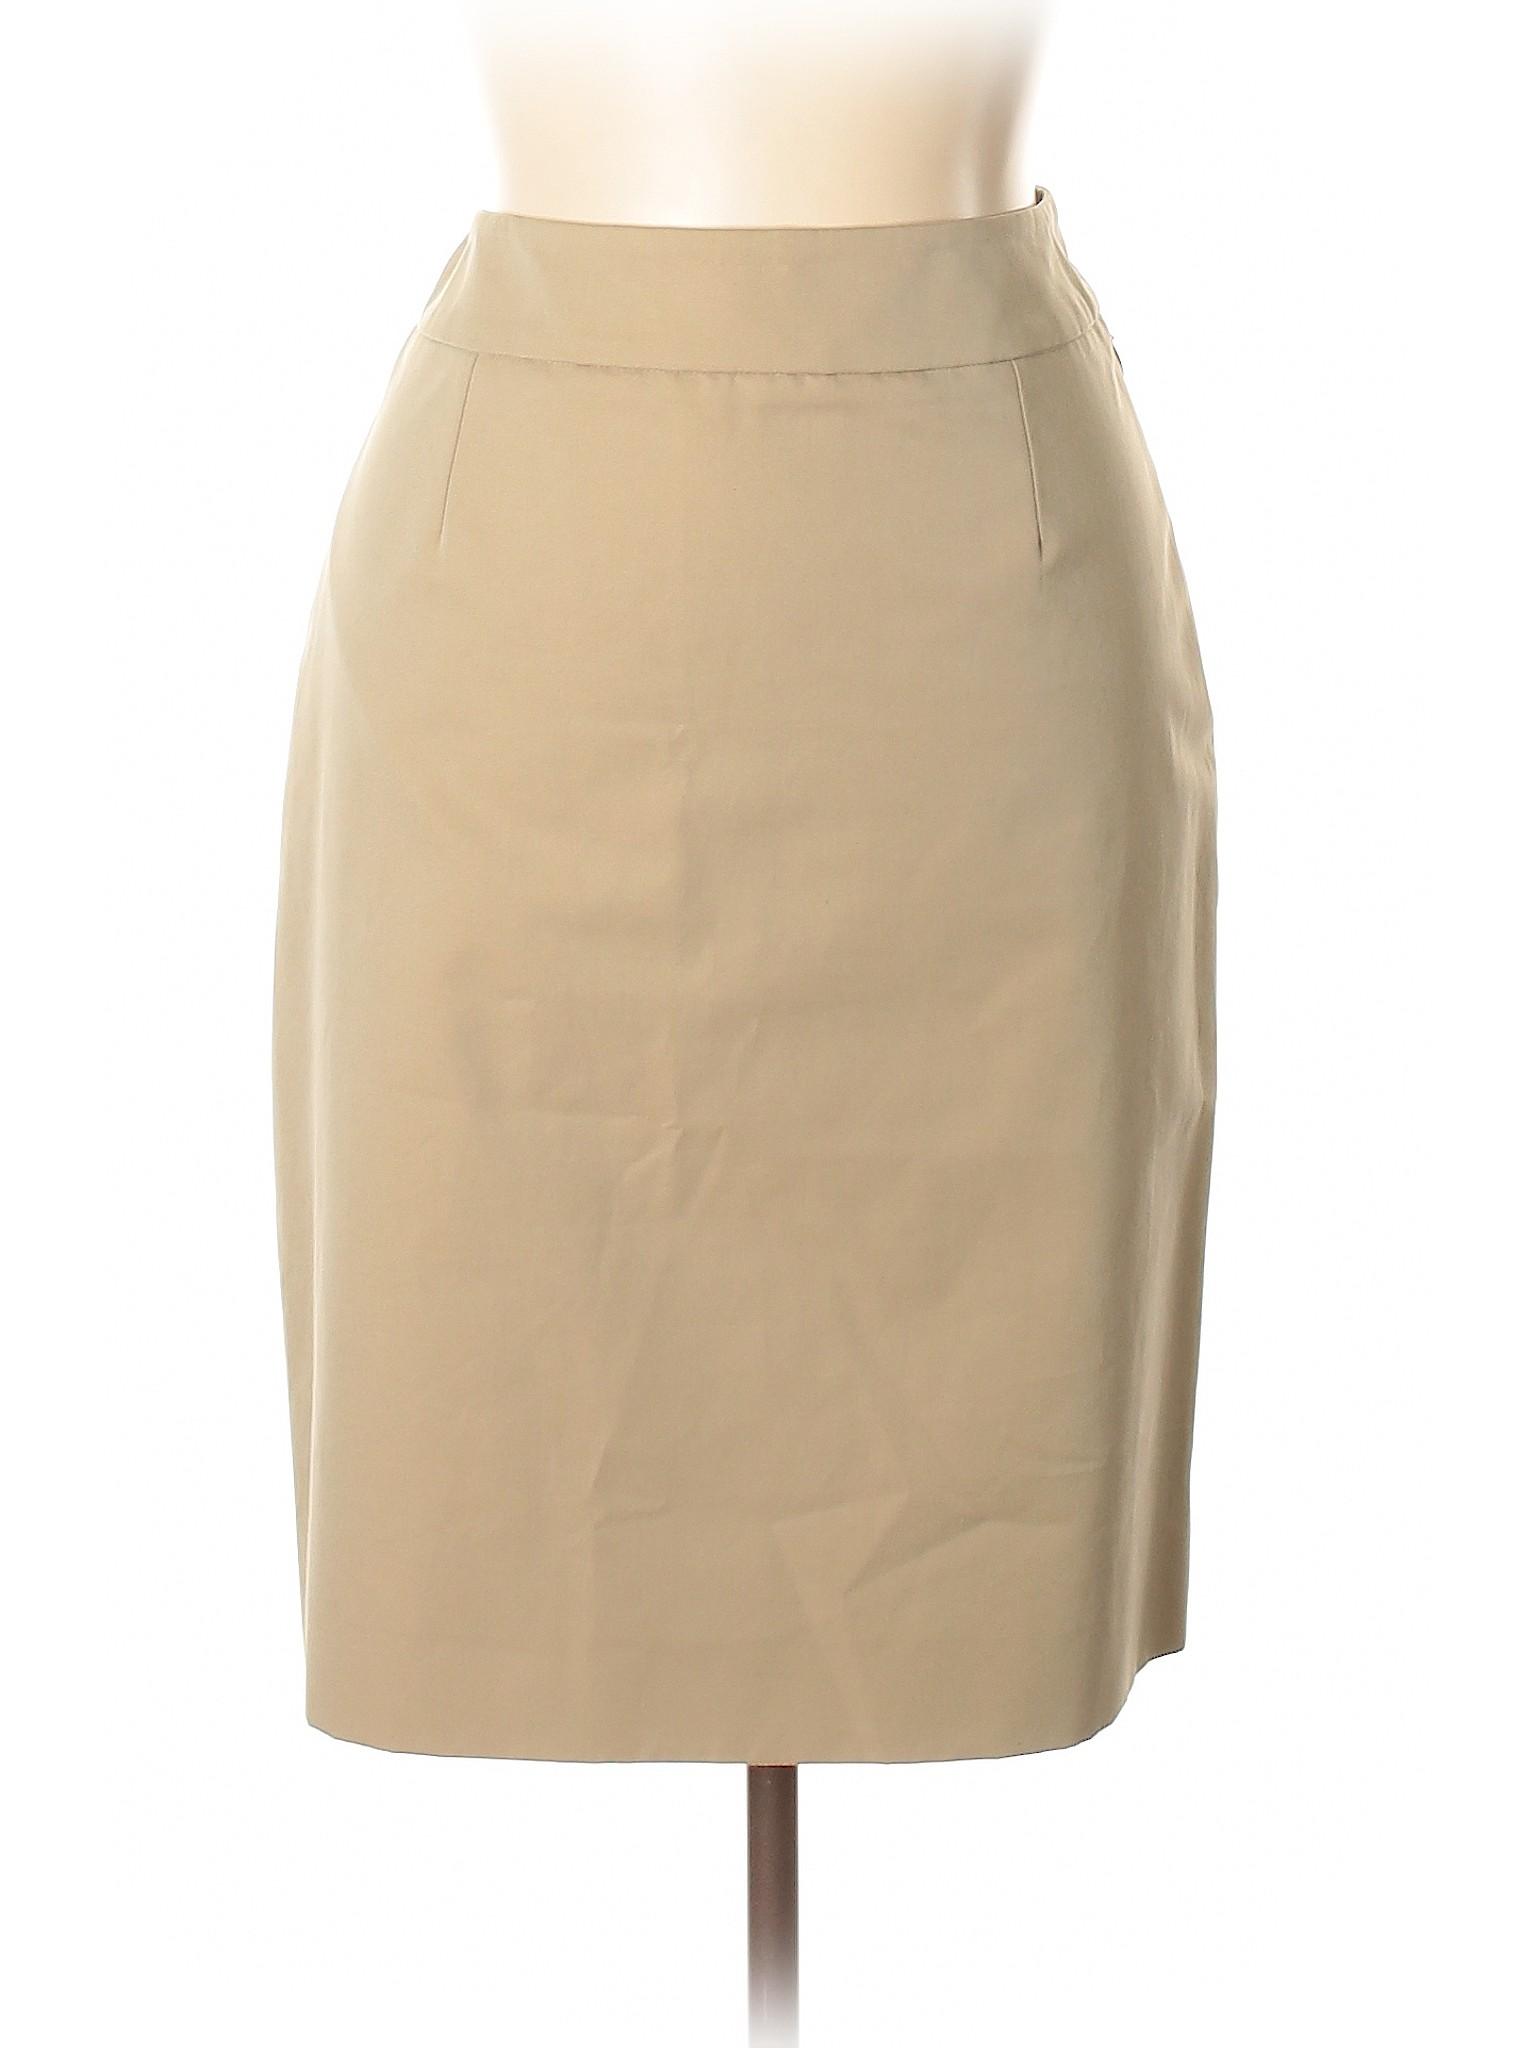 Skirt Boutique Boutique Casual Boutique Casual Skirt Casual Boutique Skirt Casual Boutique Skirt Skirt Casual xwPx81q4